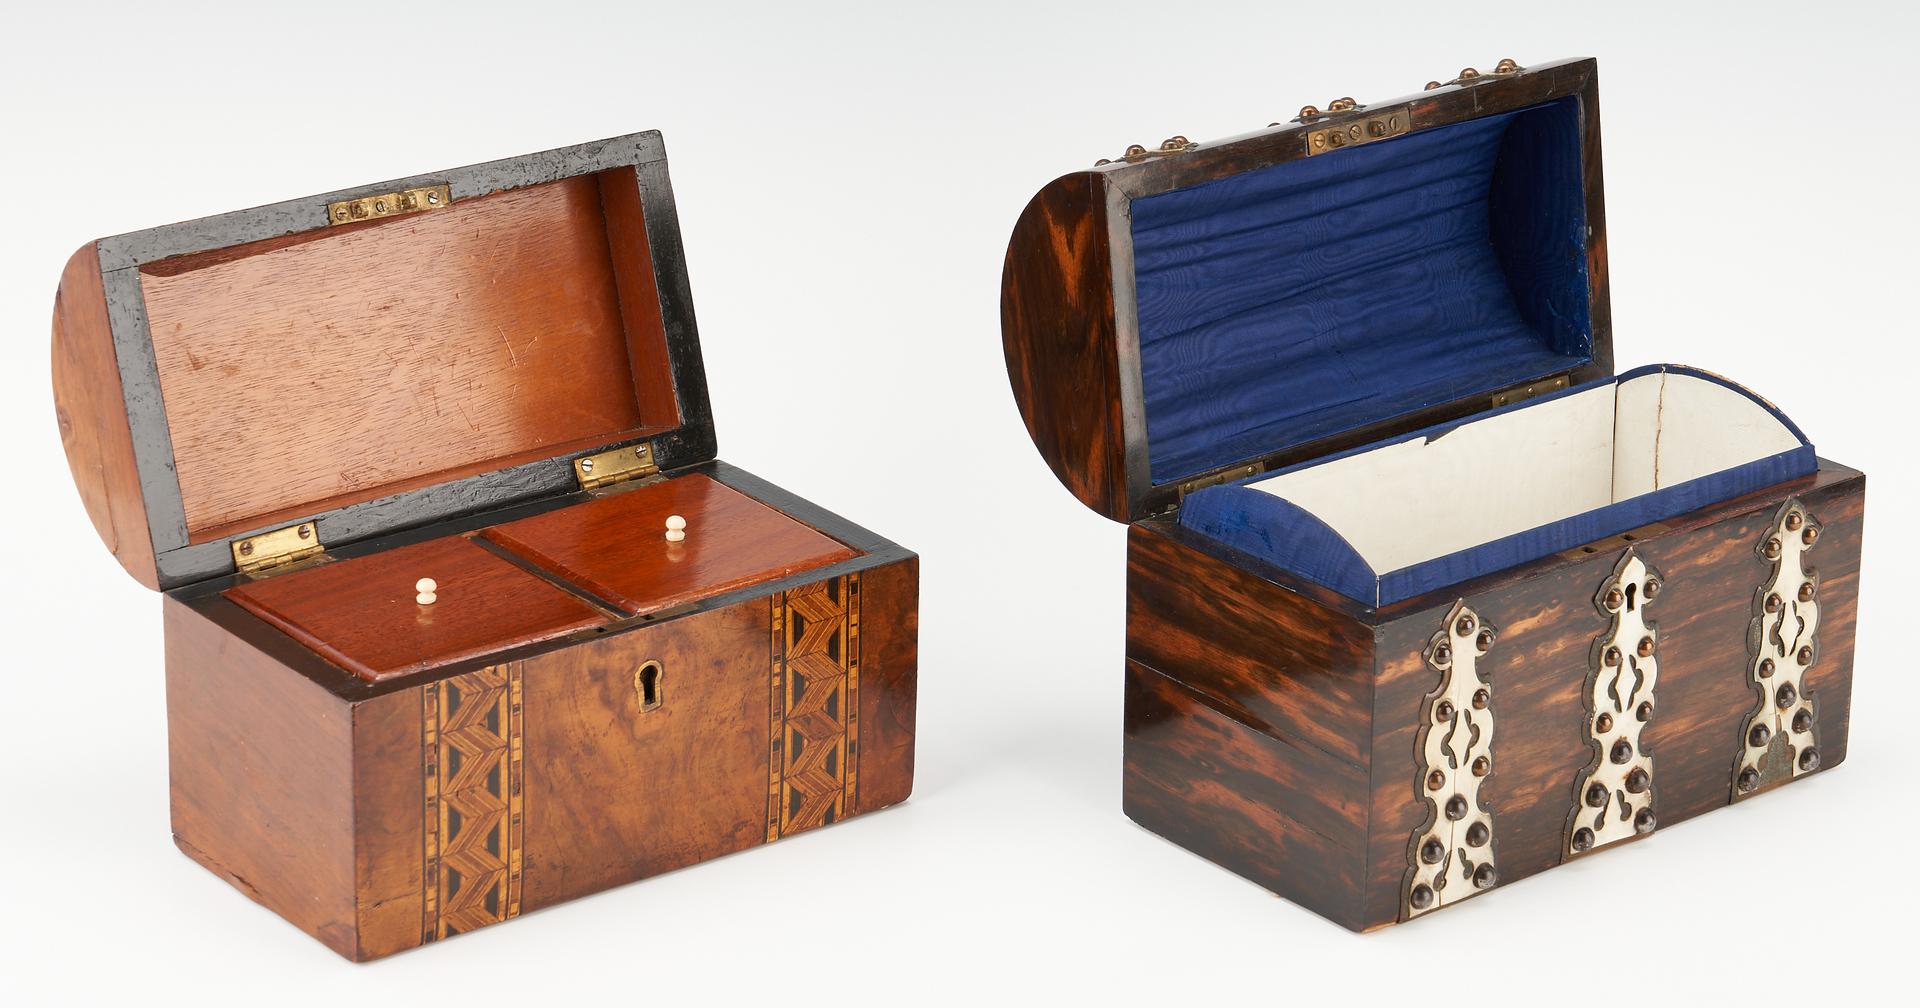 Lot 967: 2 Wood Dome Top Storage Boxes, incl. Burl & Coromandel